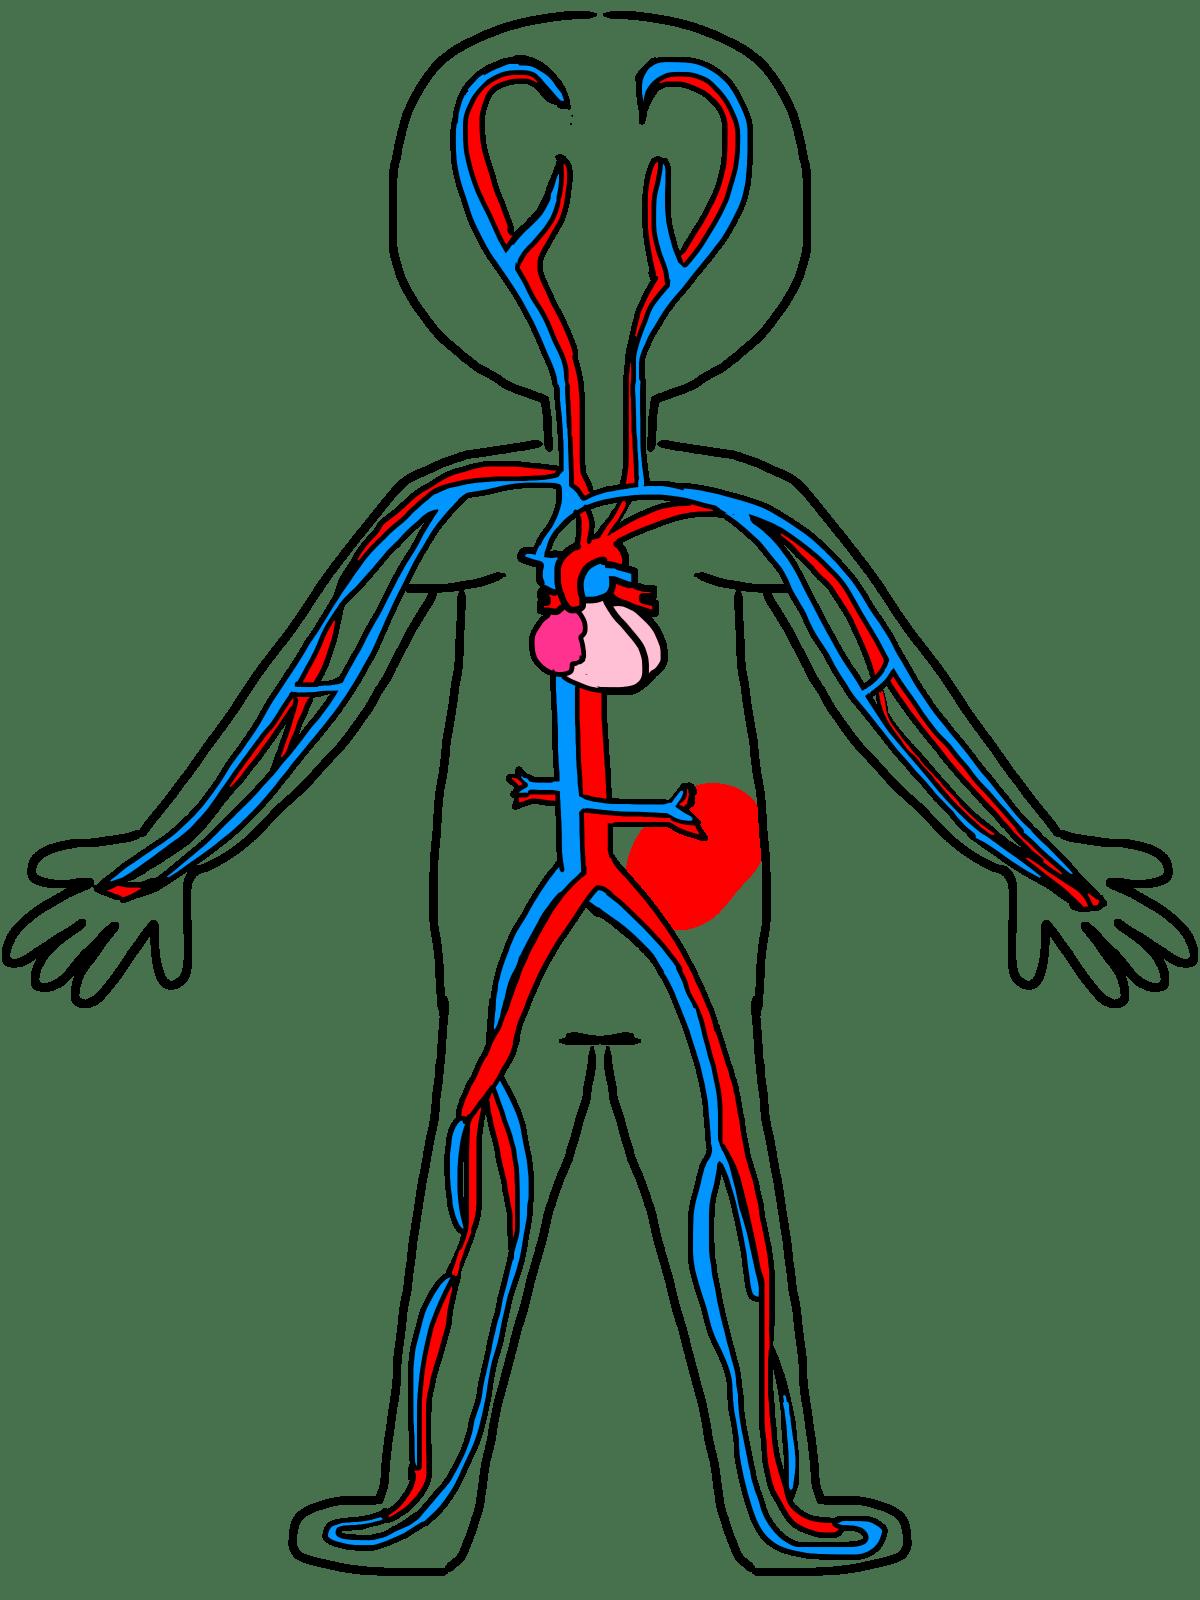 circulatory system images - HD1200×1600